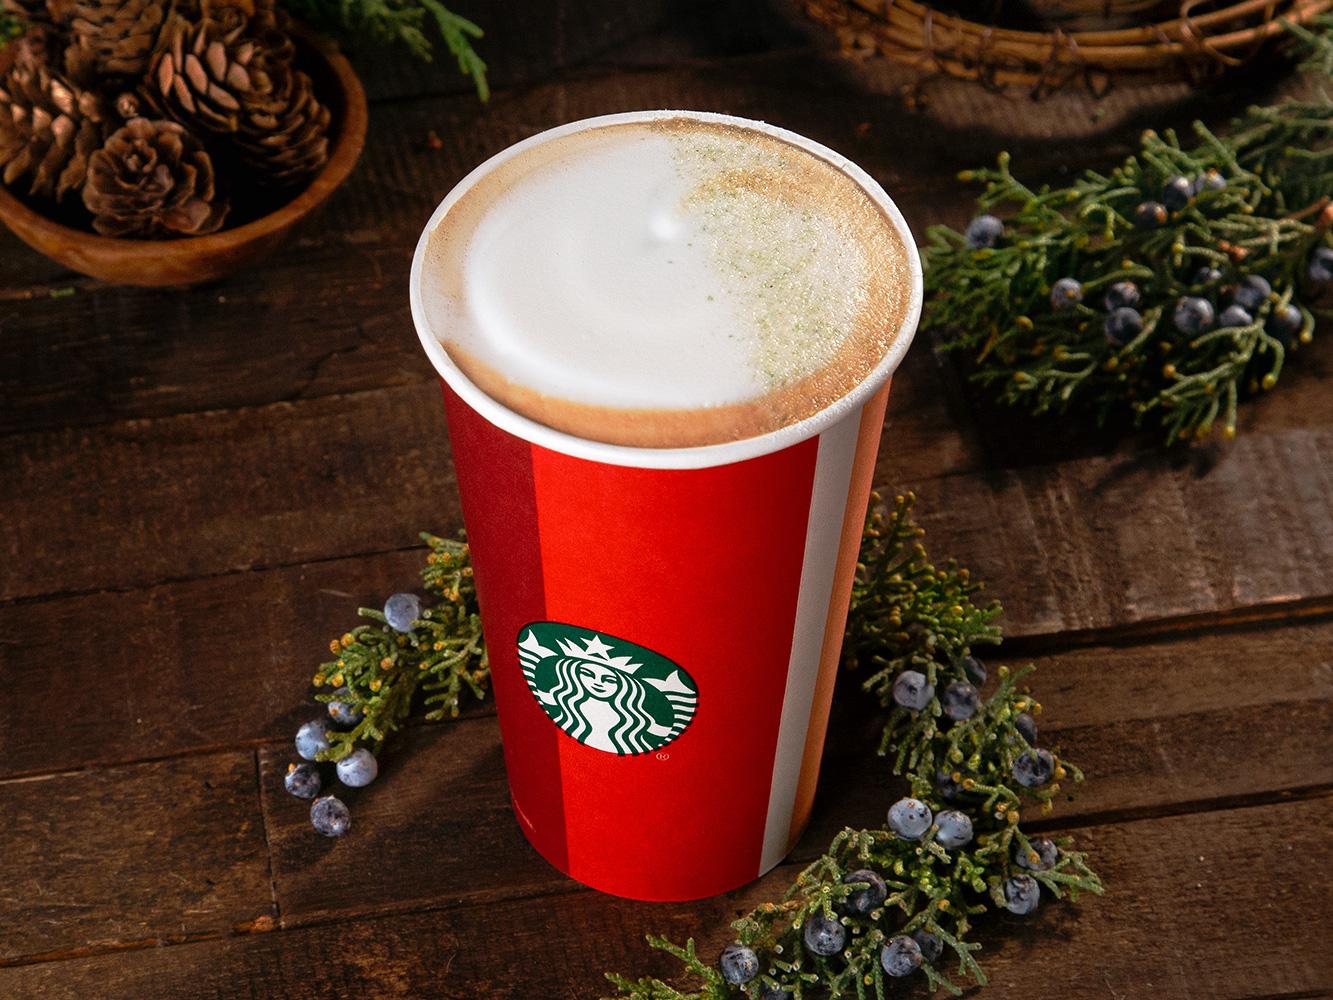 Starbucks Takes Juniper Lattes Nationwide This Winter